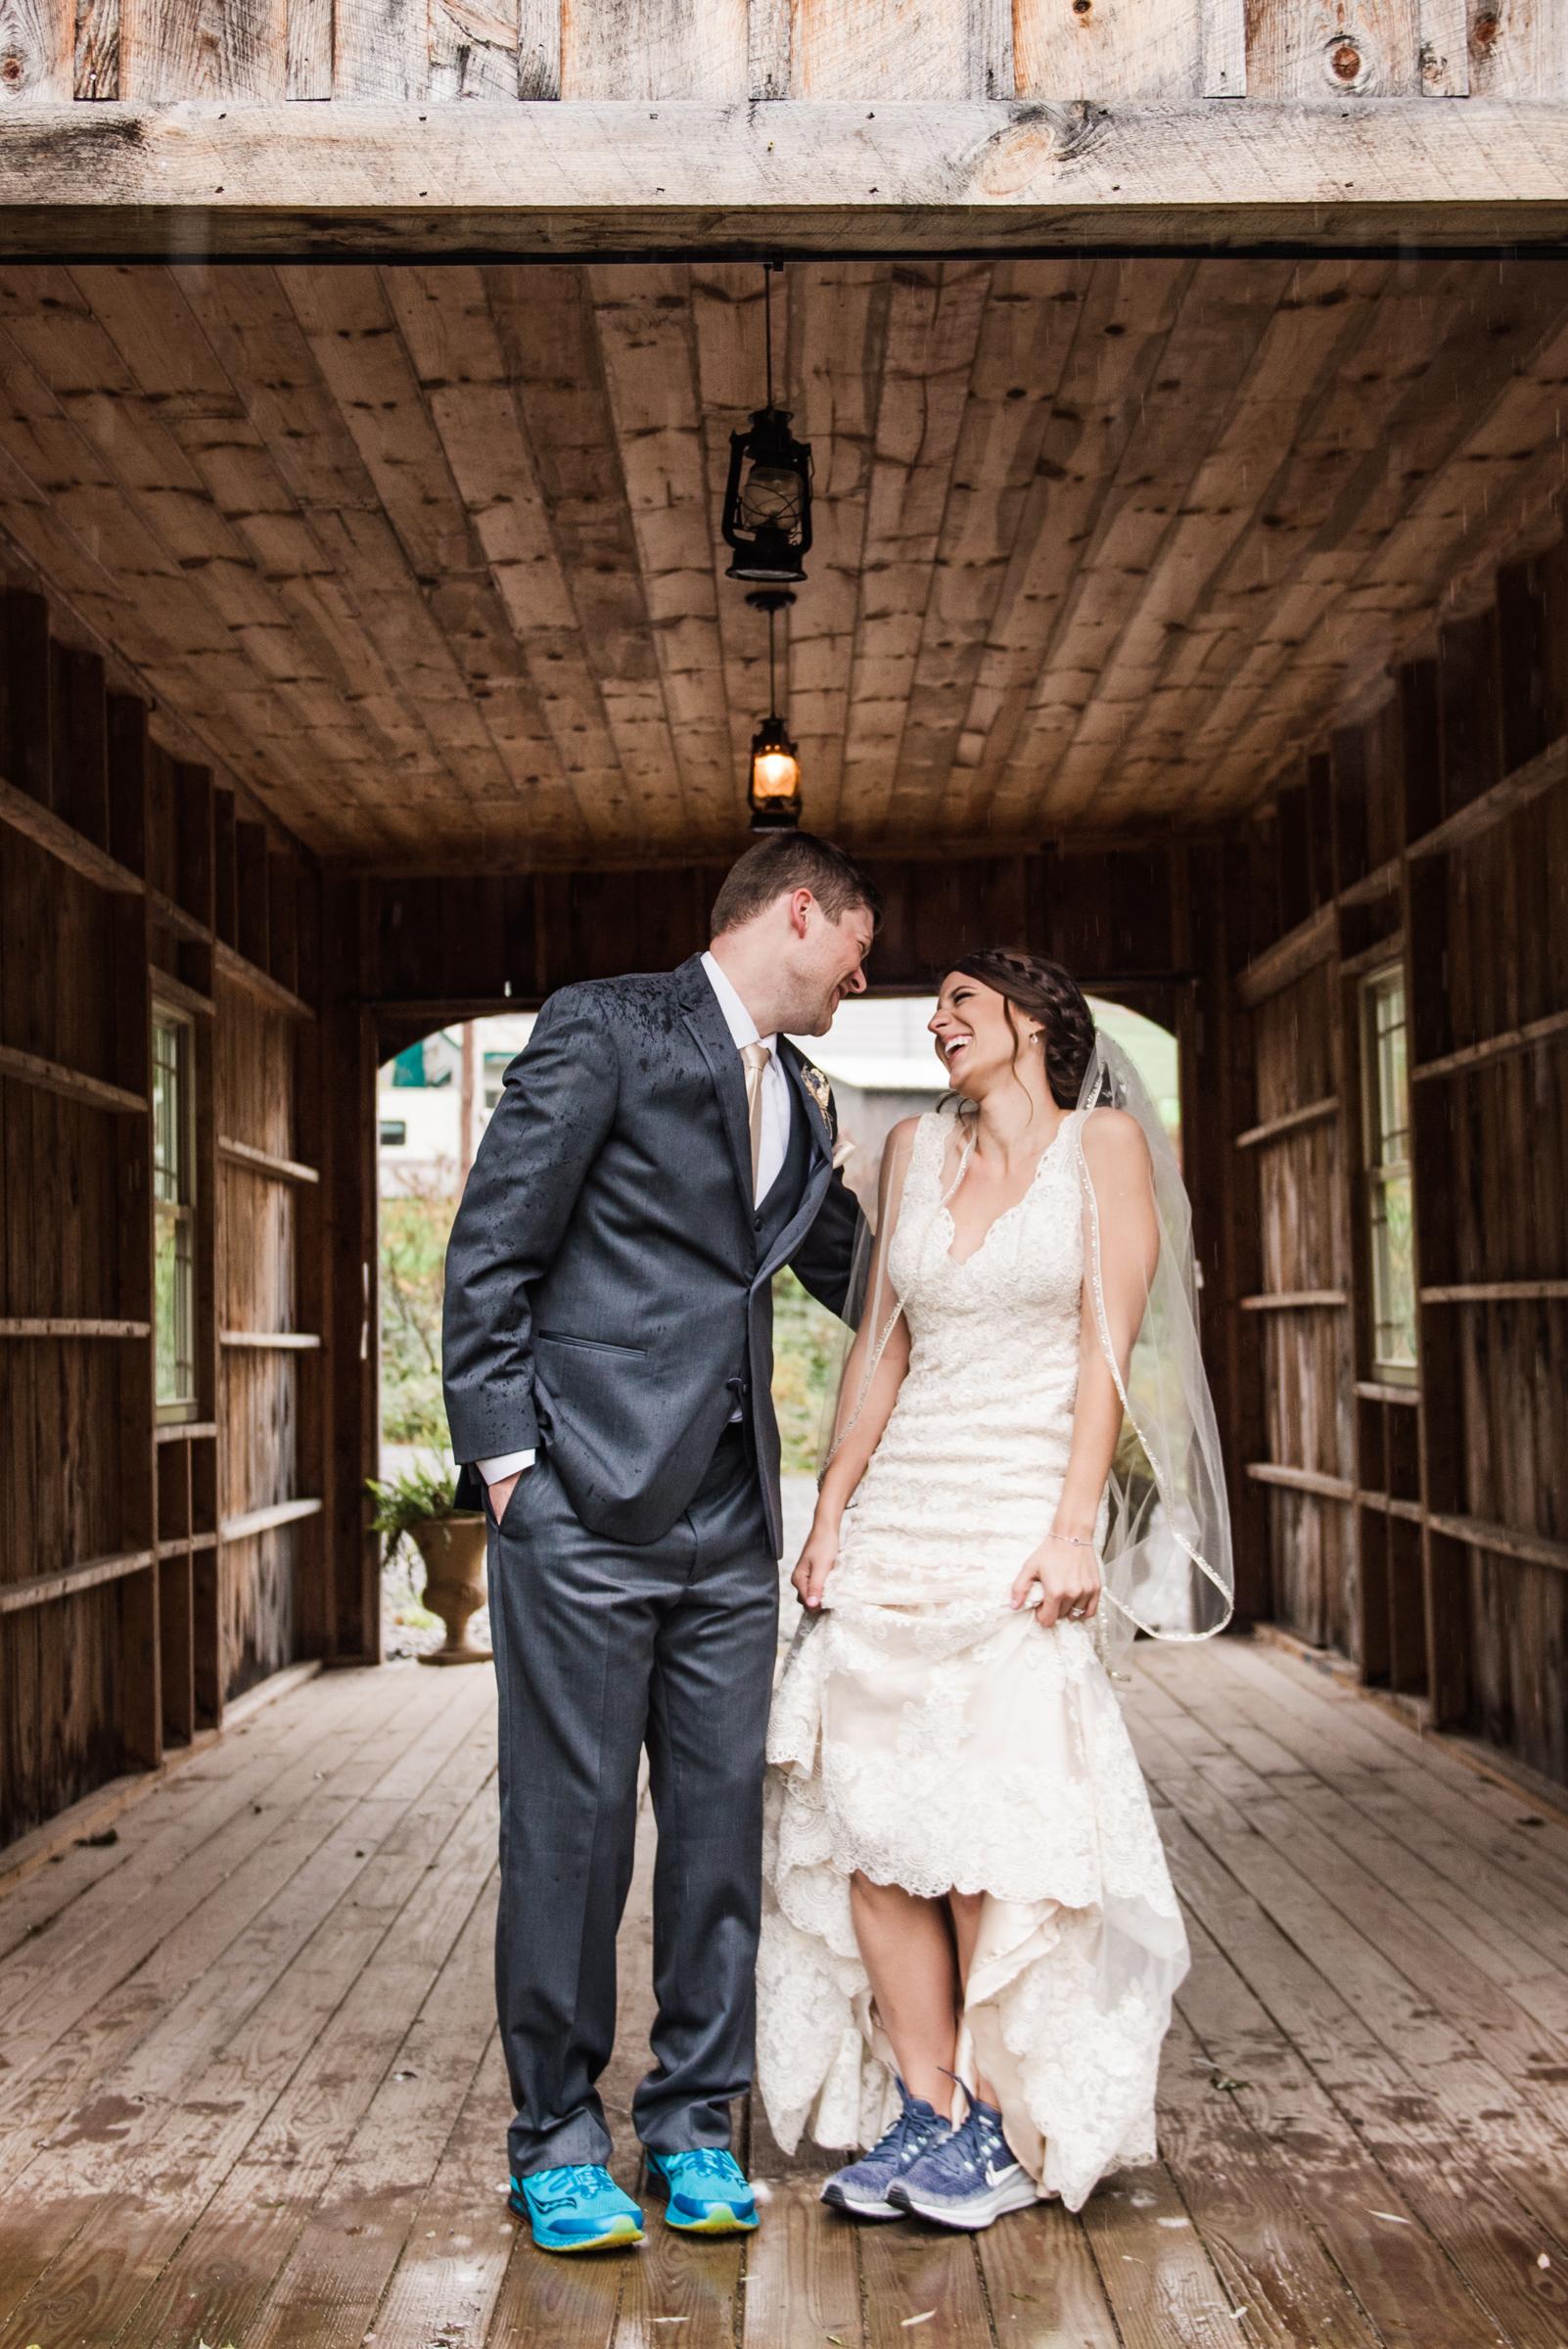 Wolf_Oak_Acres_Central_NY_Wedding_JILL_STUDIO_Rochester_NY_Photographer_DSC_7522.jpg